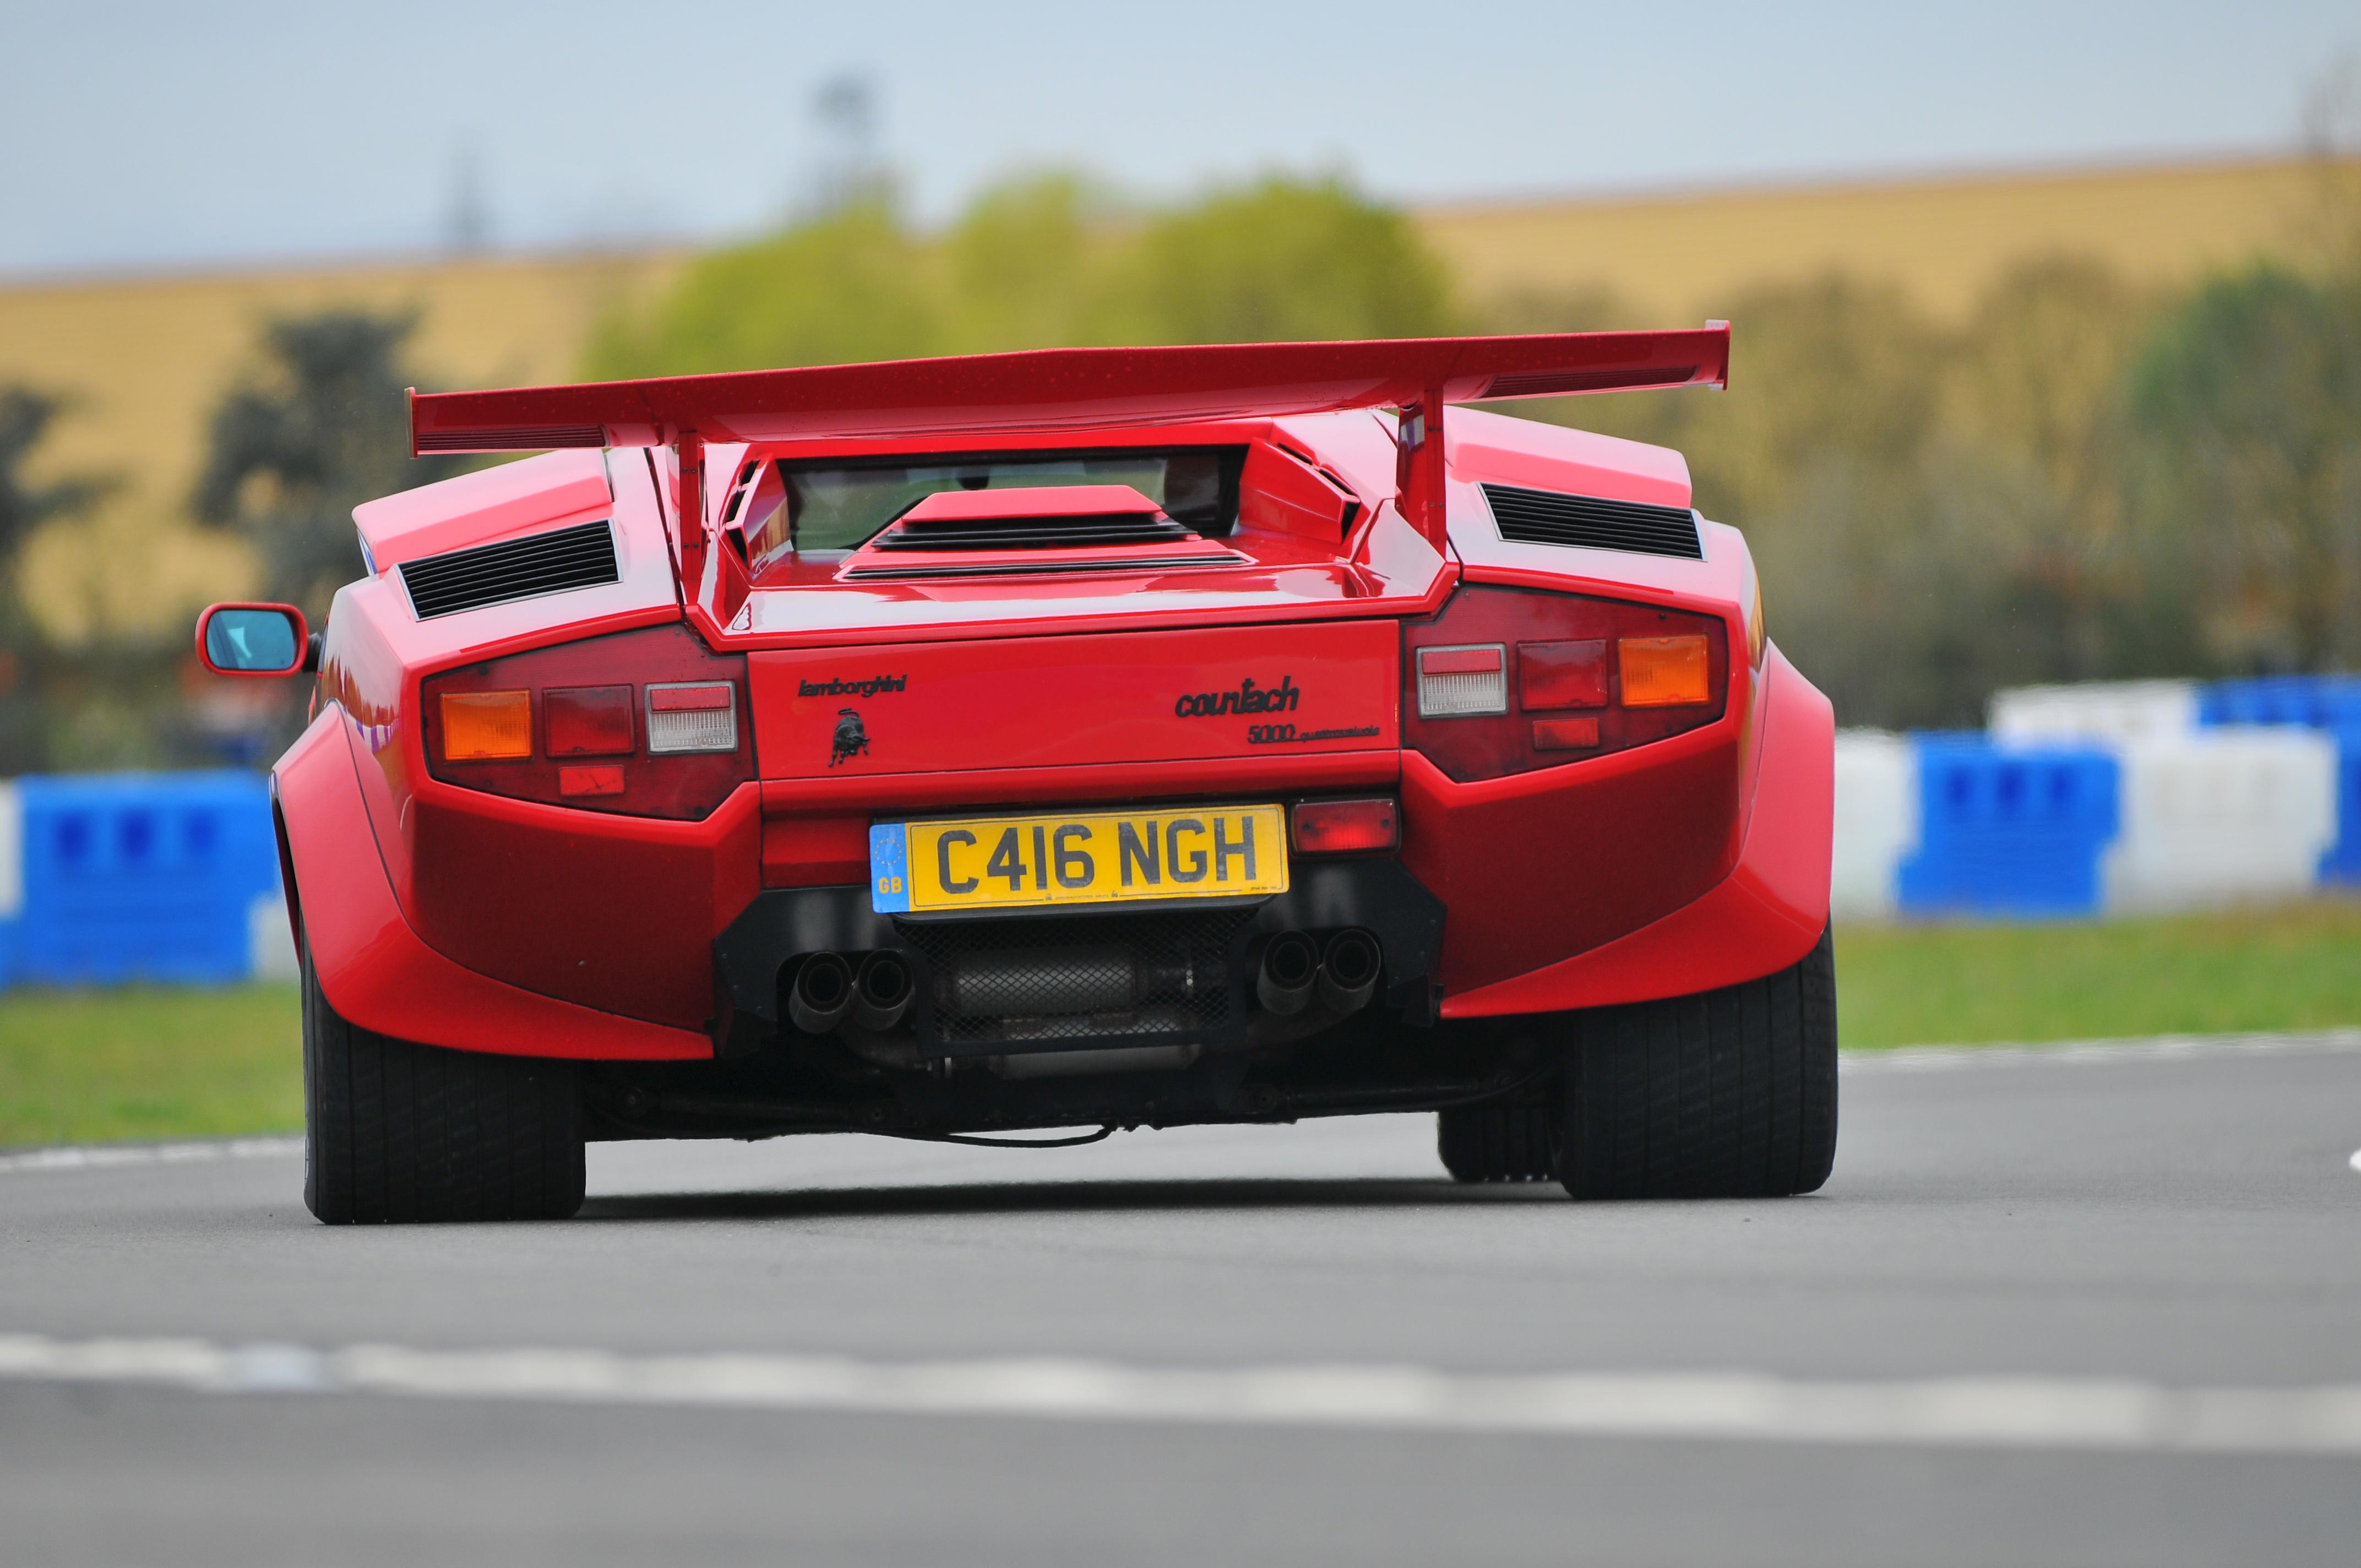 AutoItalia_Brooklands_May_2012_THP_6955_(7001801814) Exciting Lamborghini Huracán Lp 610-4 Cena Cars Trend